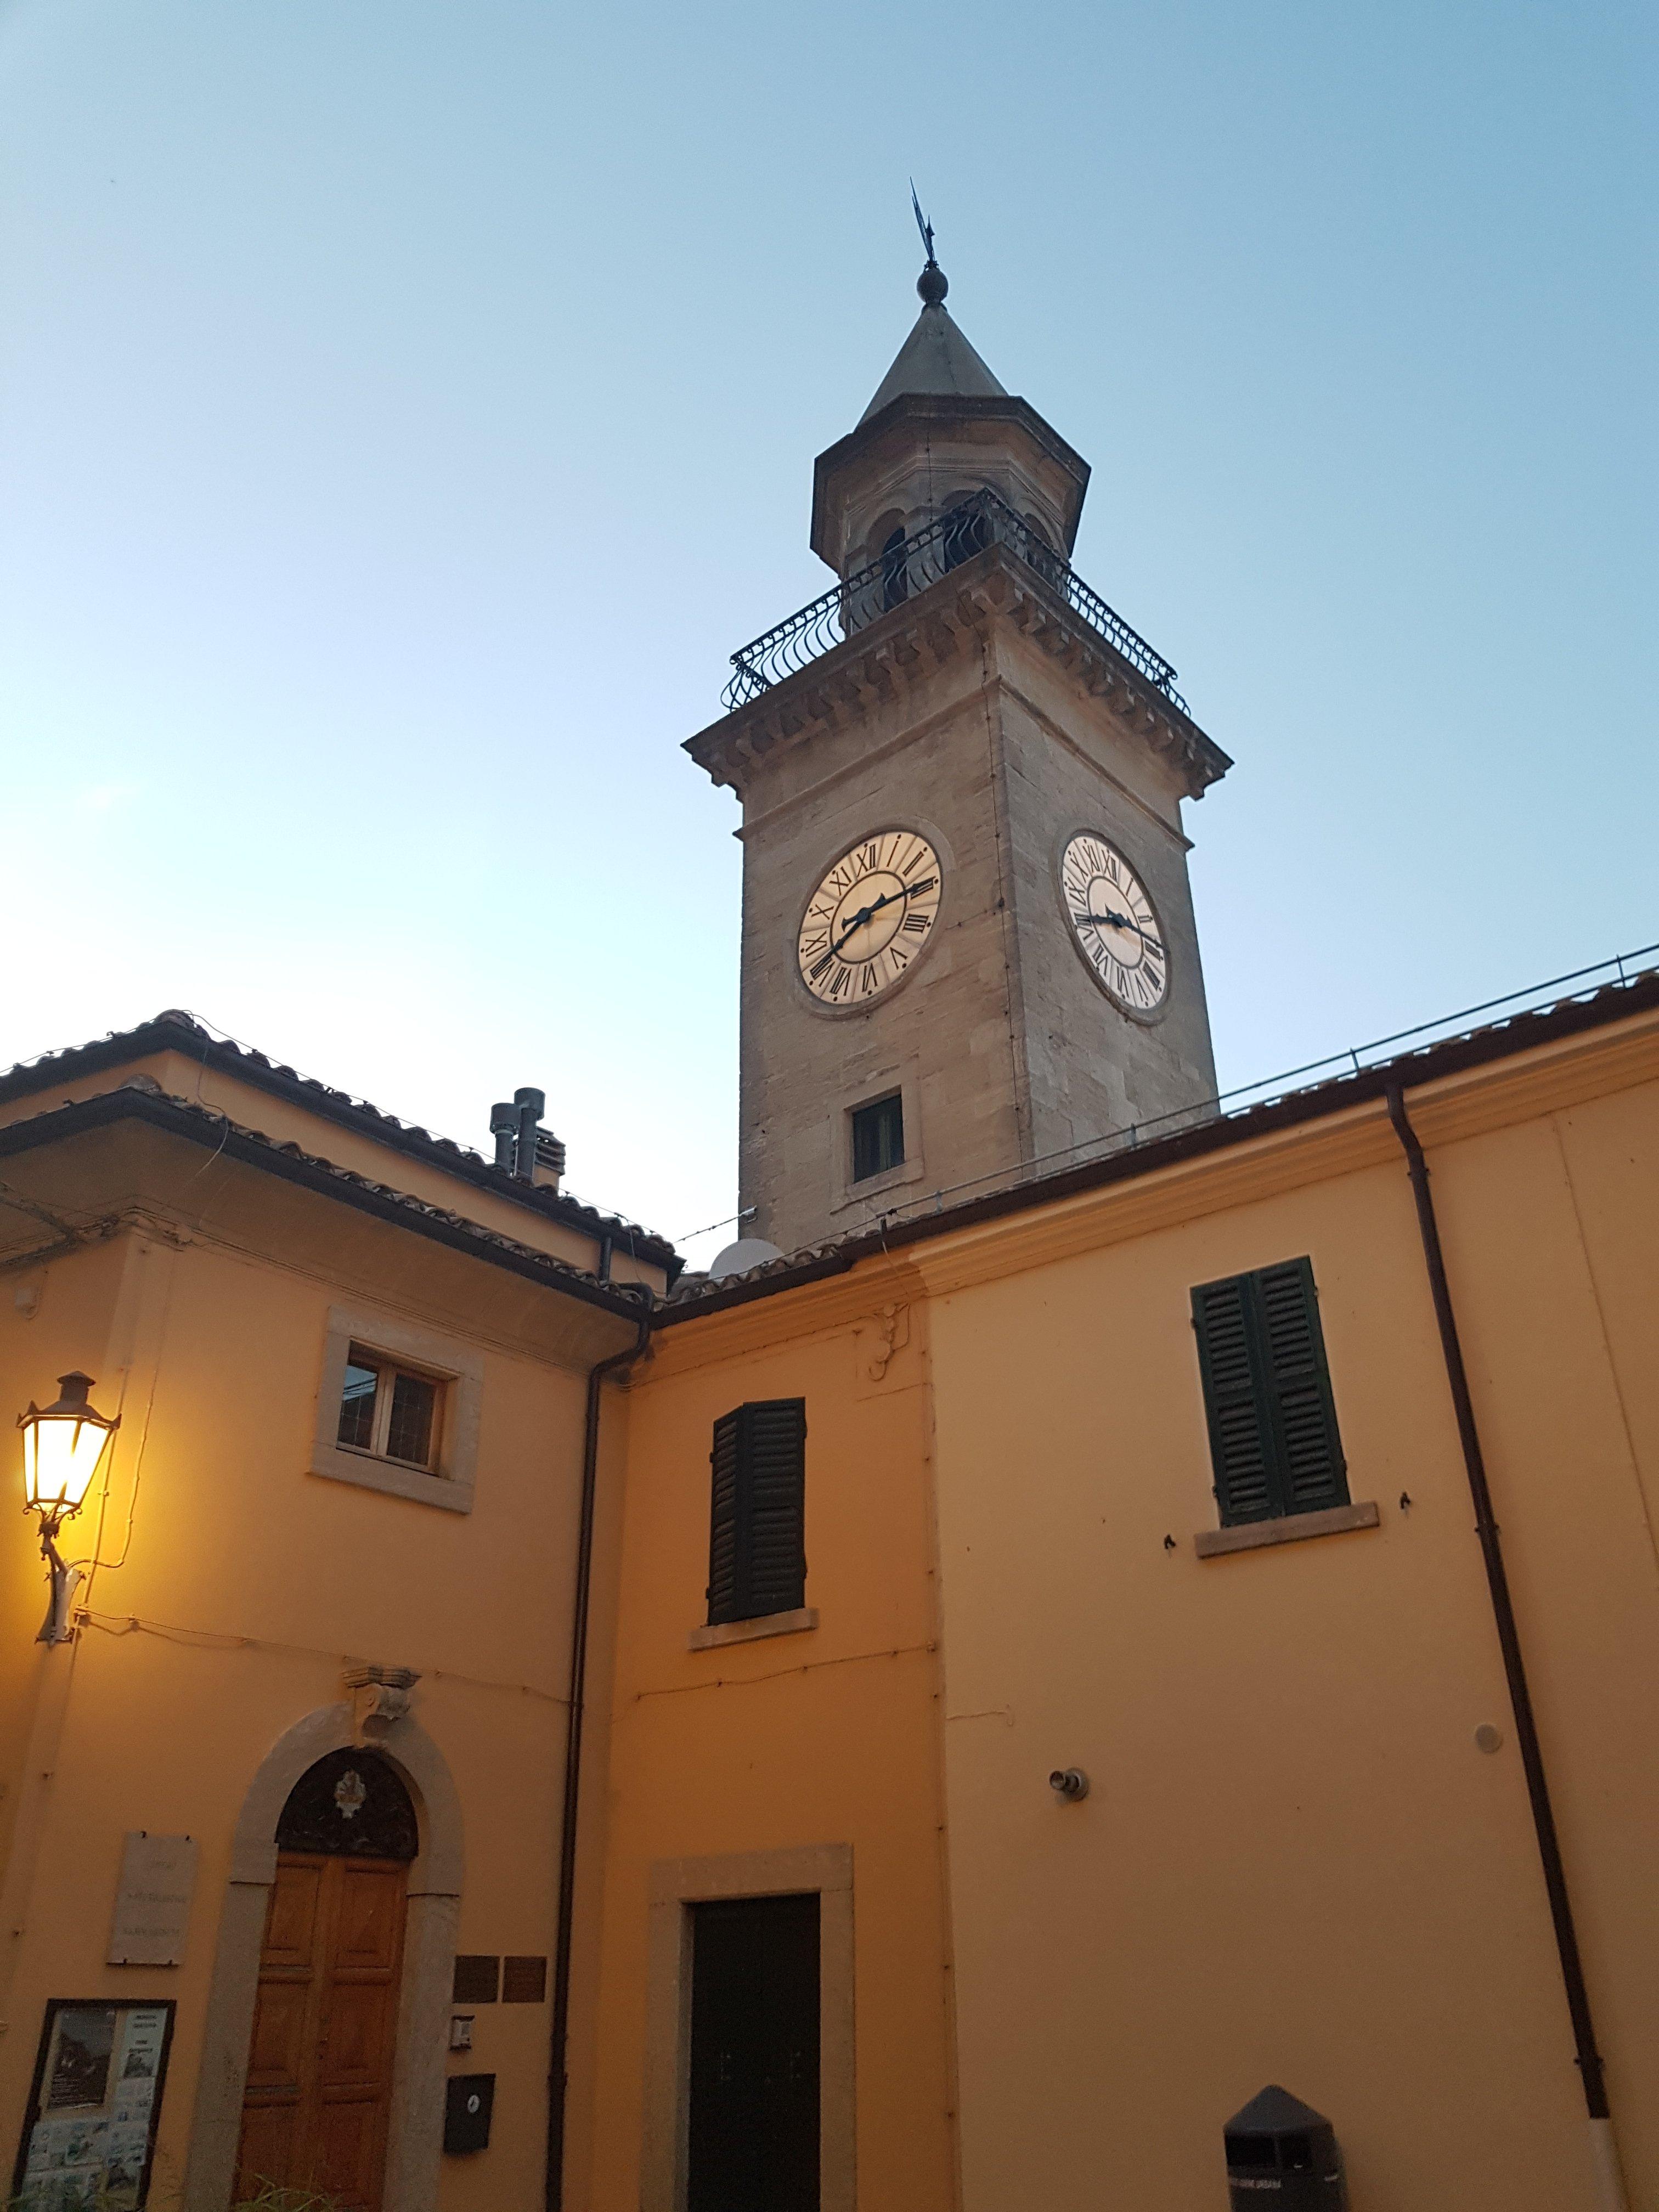 Mică, dar frumoasă-San Marino. 🇸🇲 7